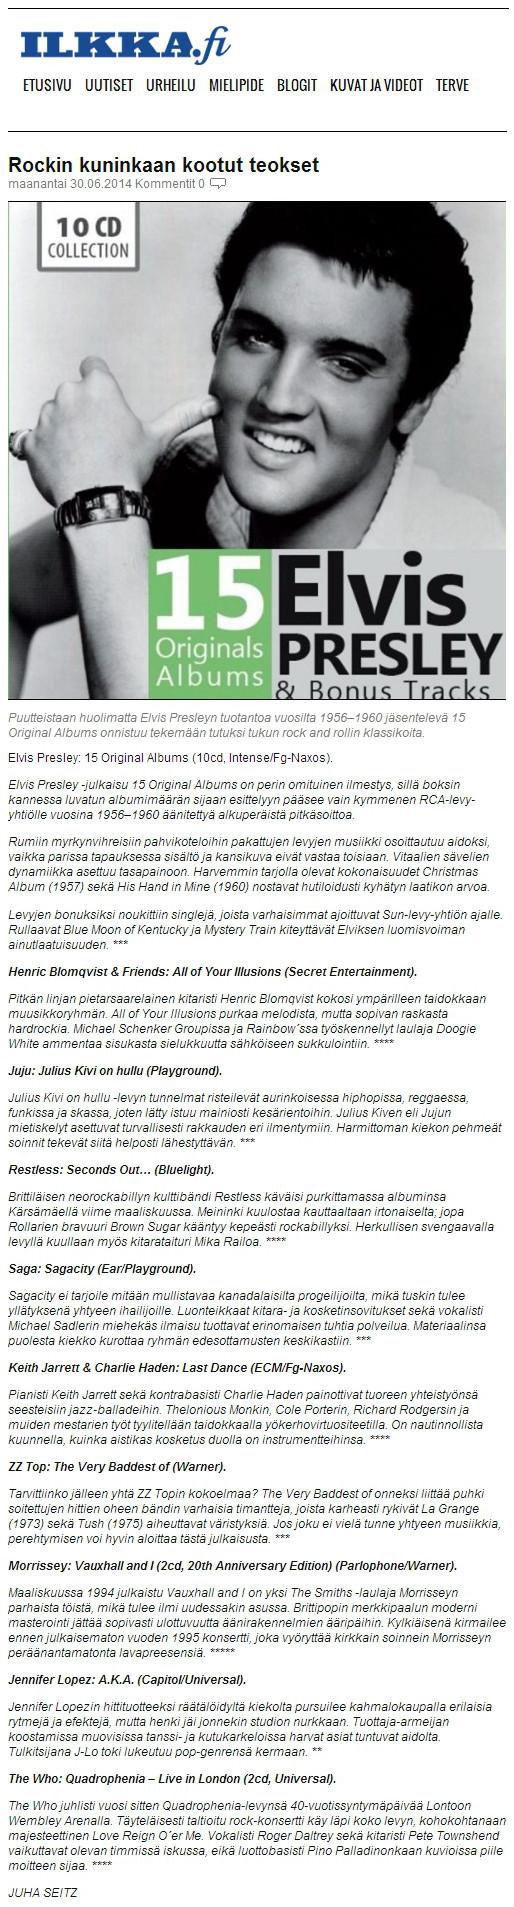 2014-06-30-hbf-ilkka